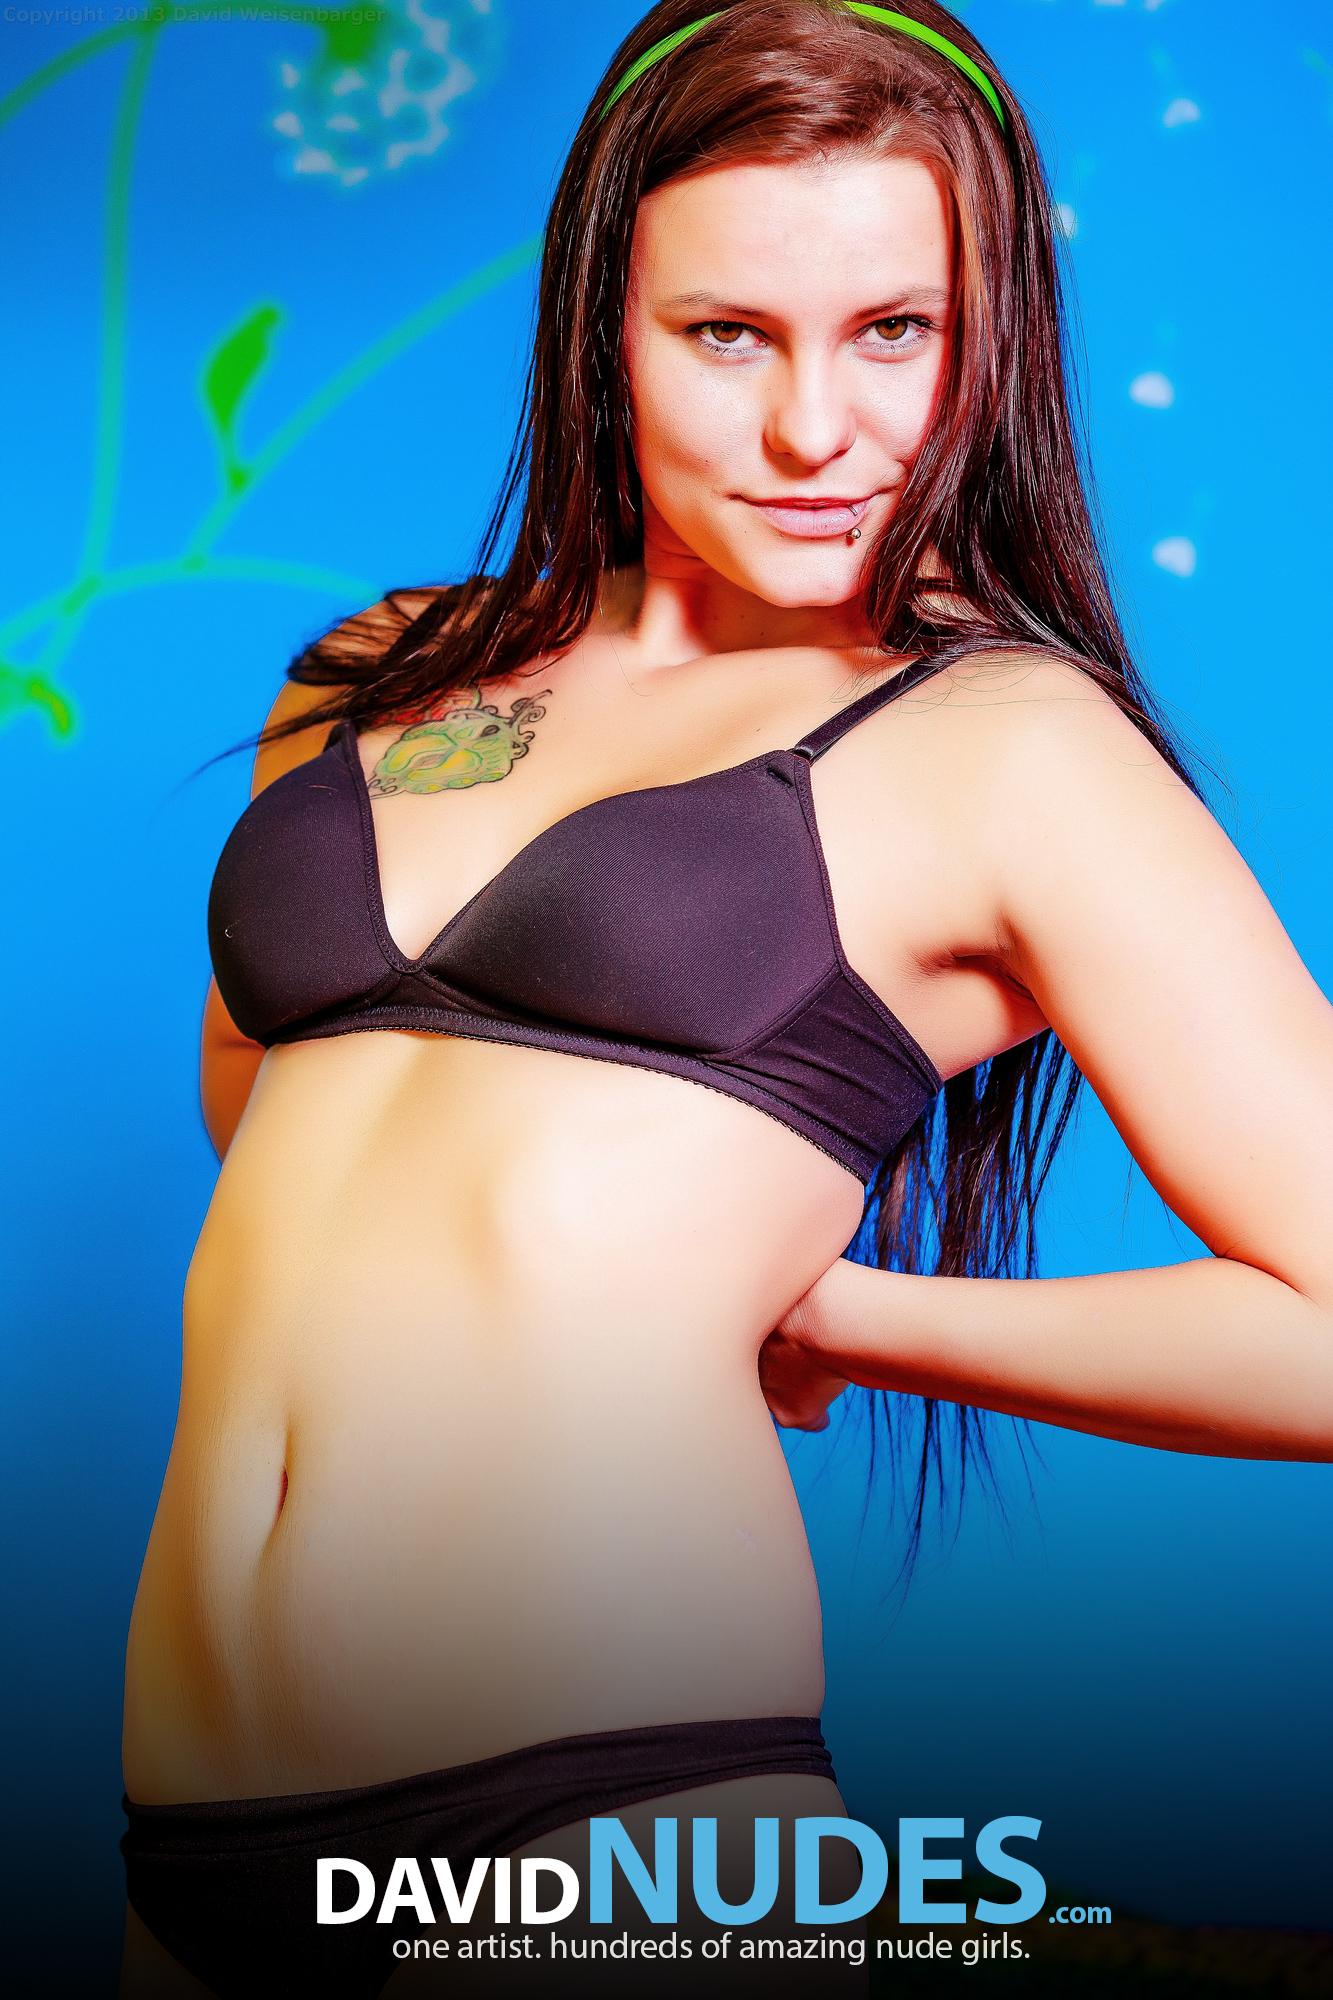 David Nudes Sasha Teen Stripping Smiling Teen In Her Bed Strips ...